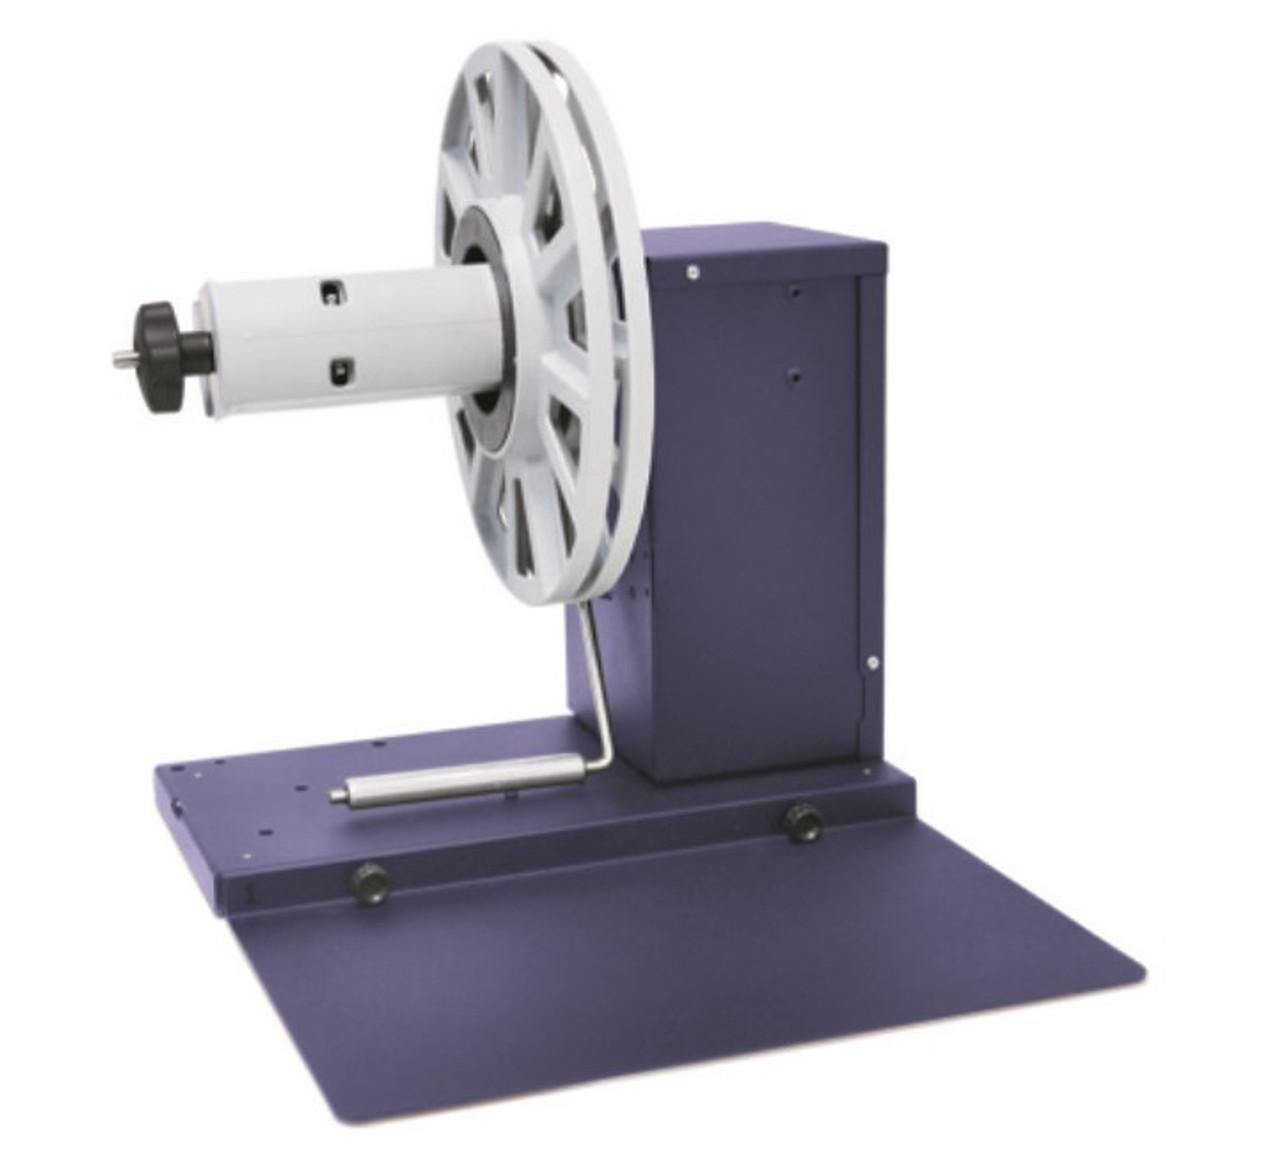 "TM-C3500 40x Label Rewinder with 3"" core holder"